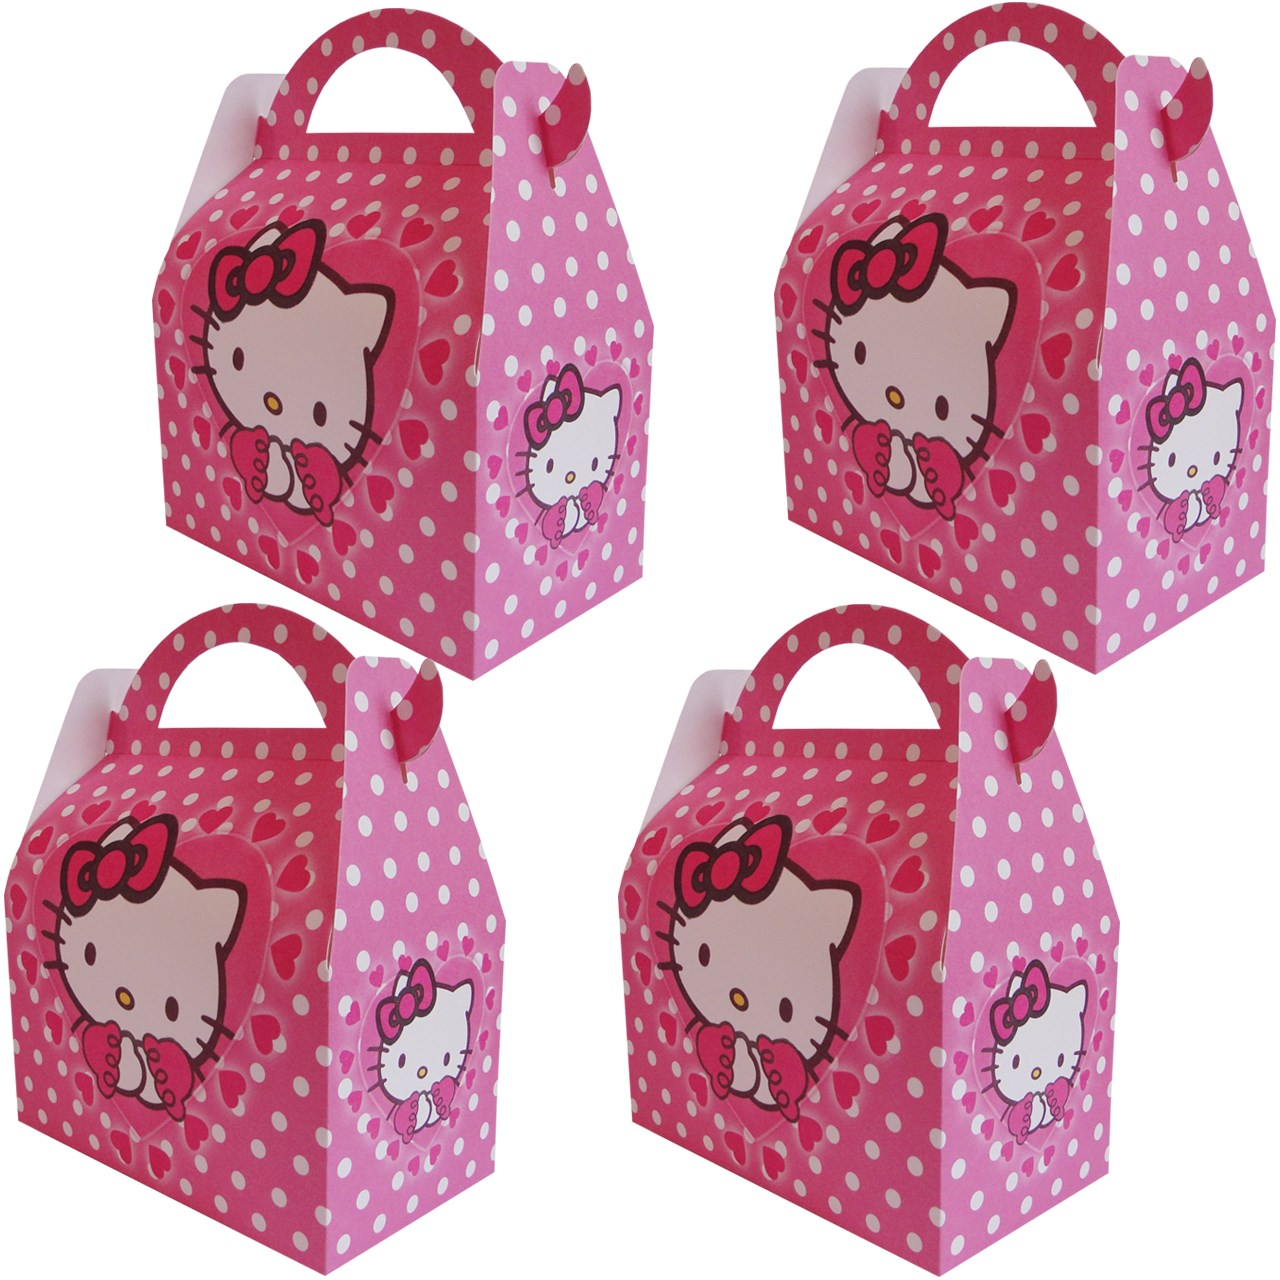 عکس جعبه کادویی طرح Hello Kitty کد 08711 بسته 4 عددی